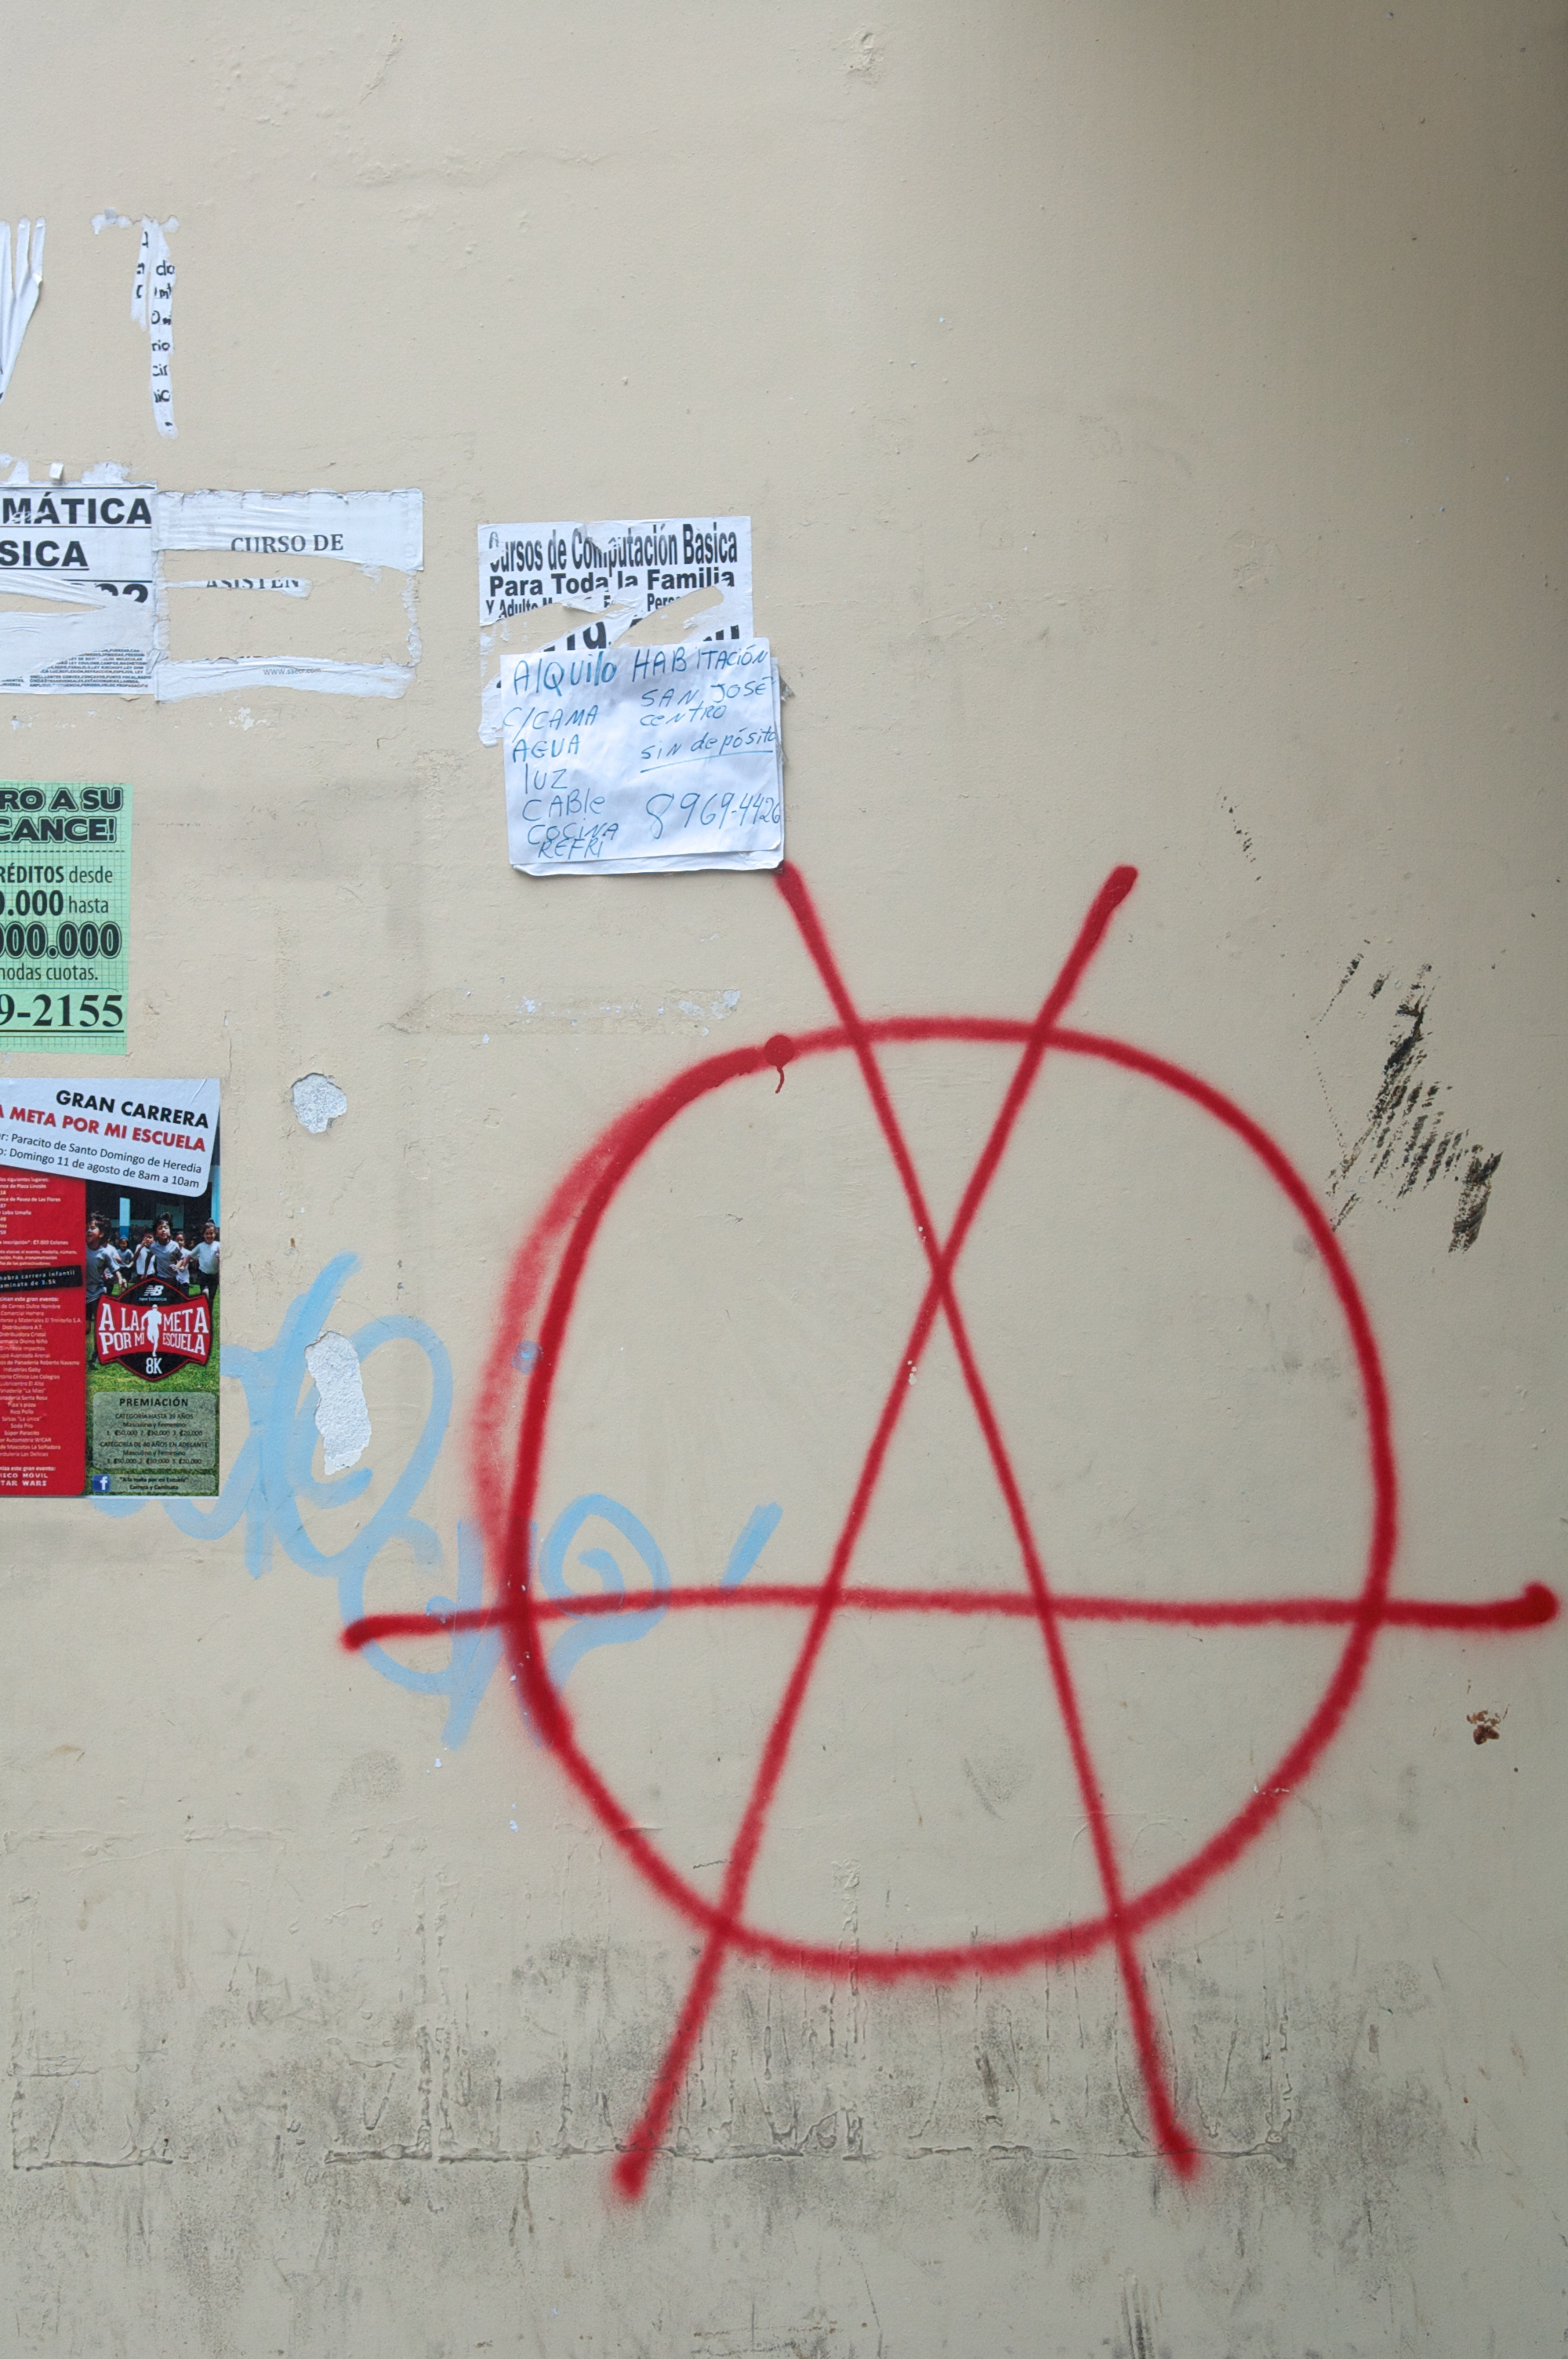 anarchy in san jose